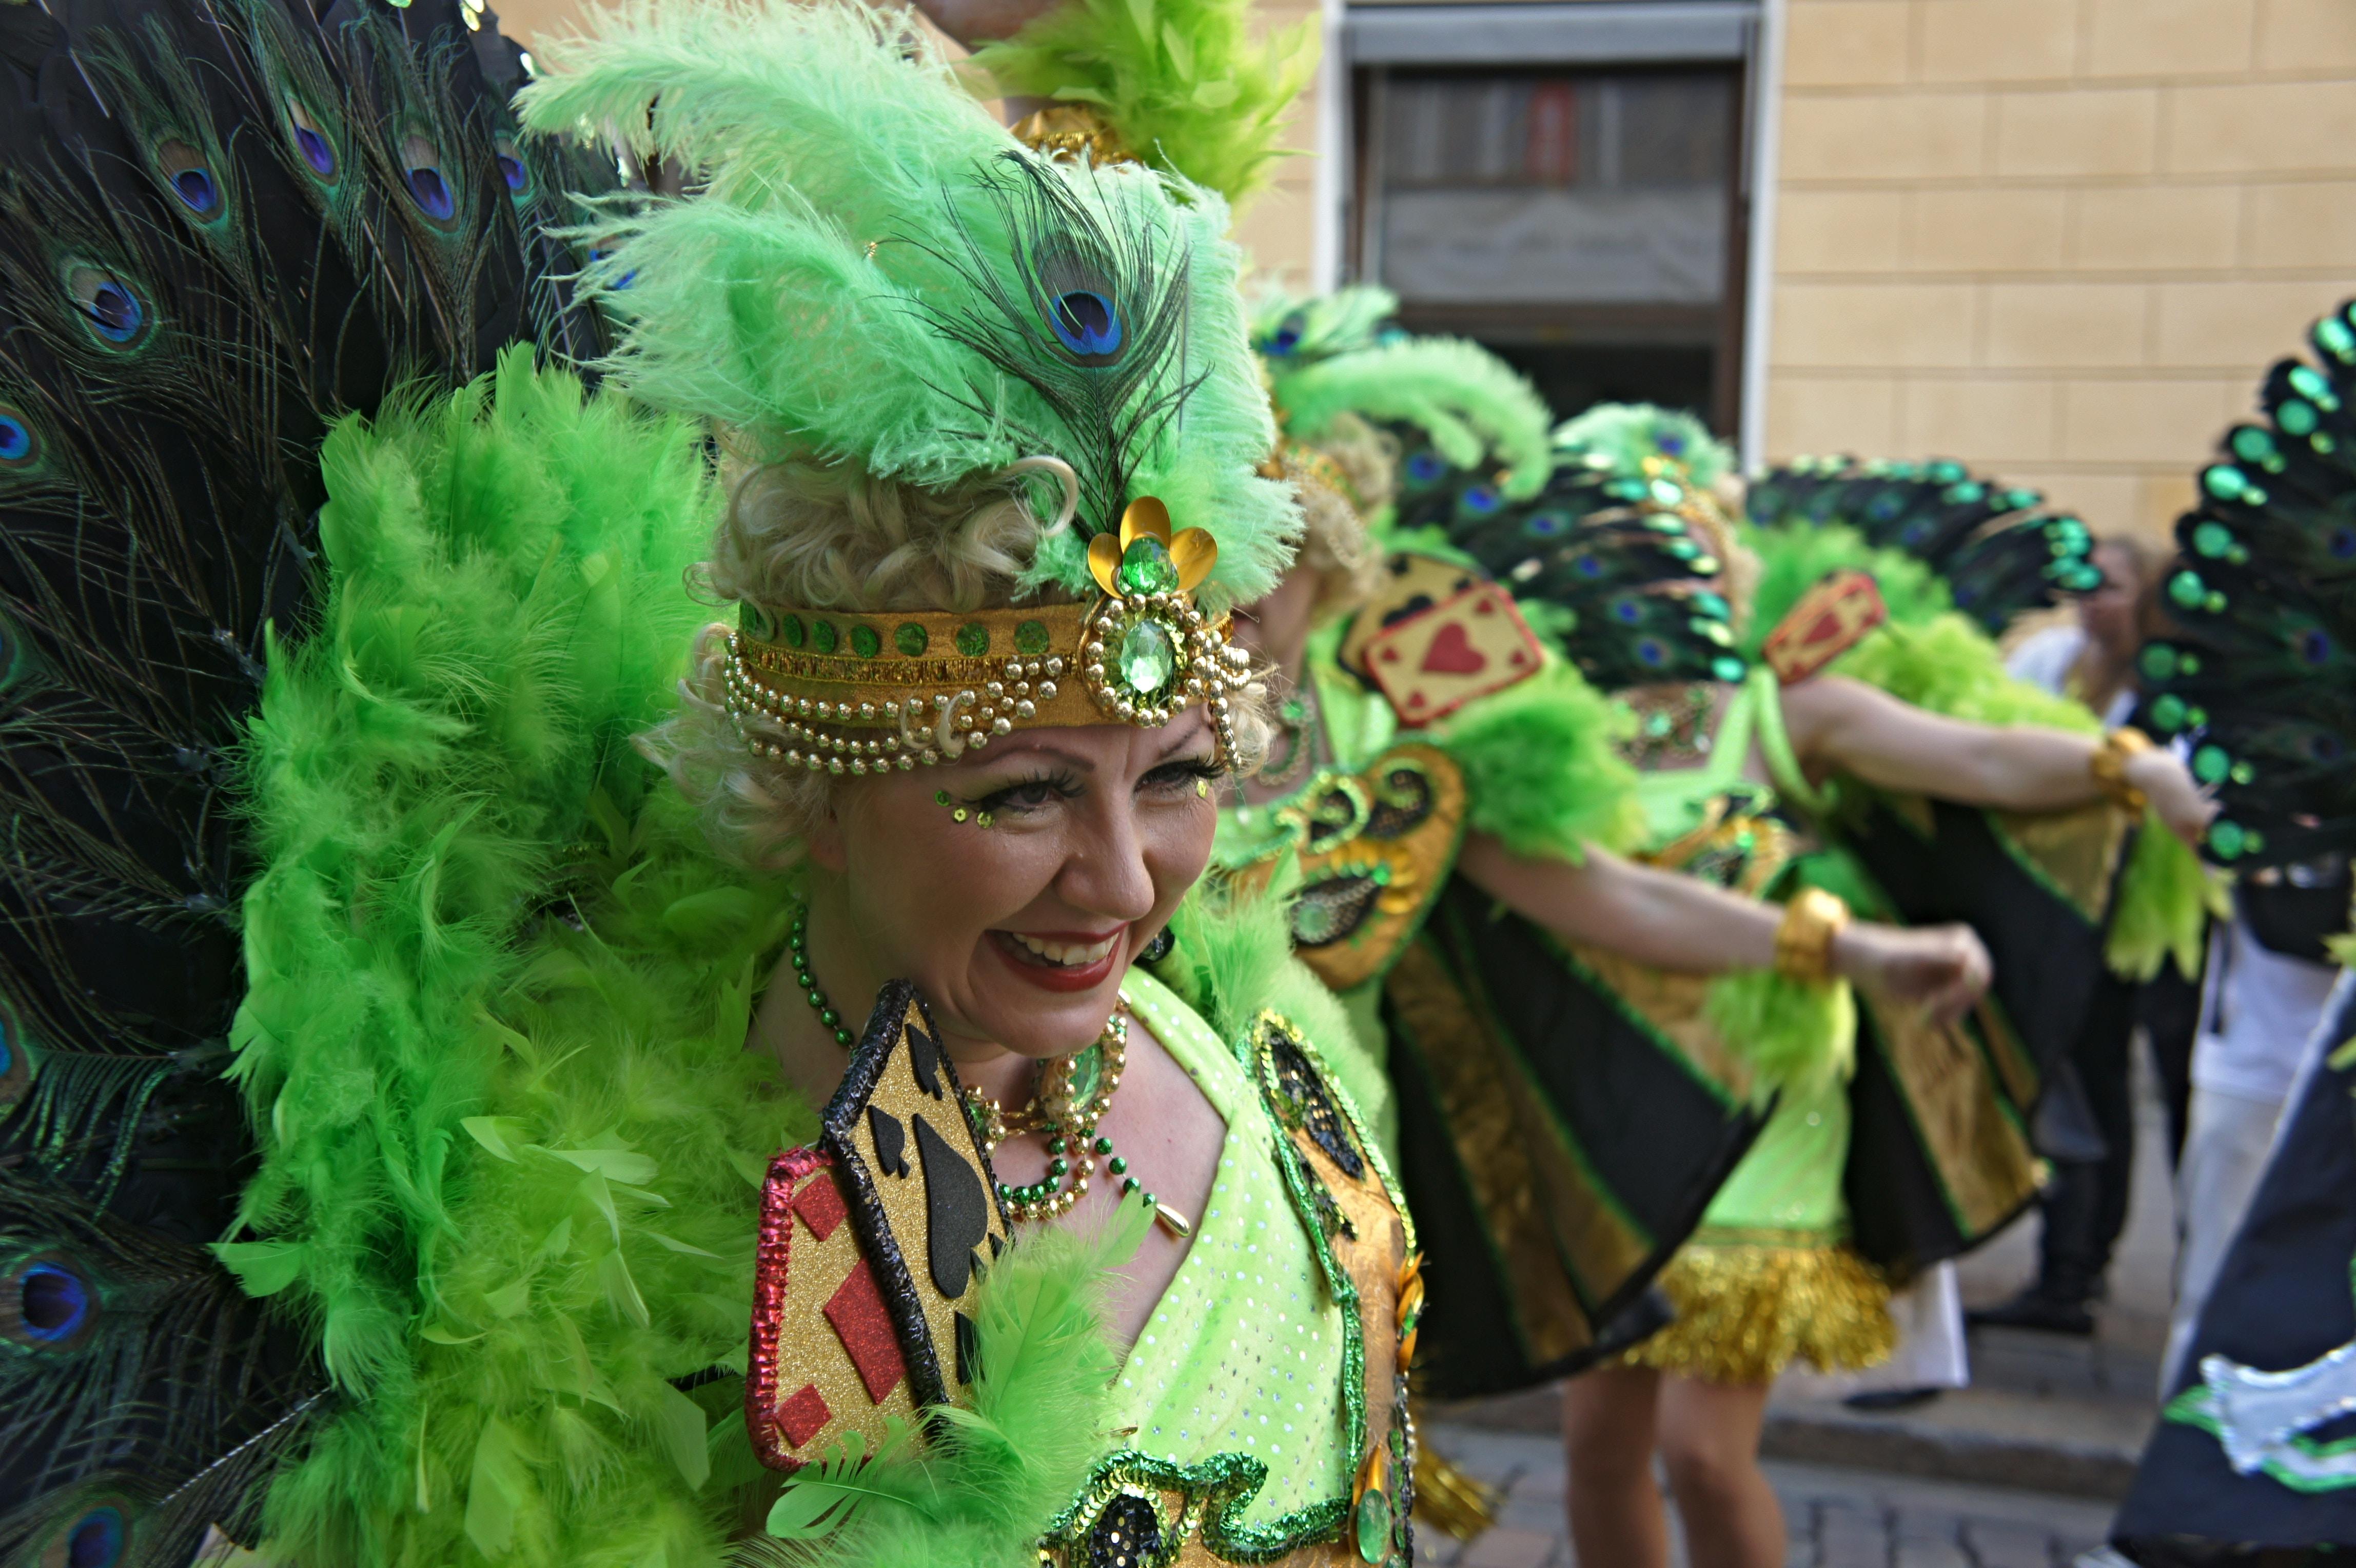 woman in green dress standing